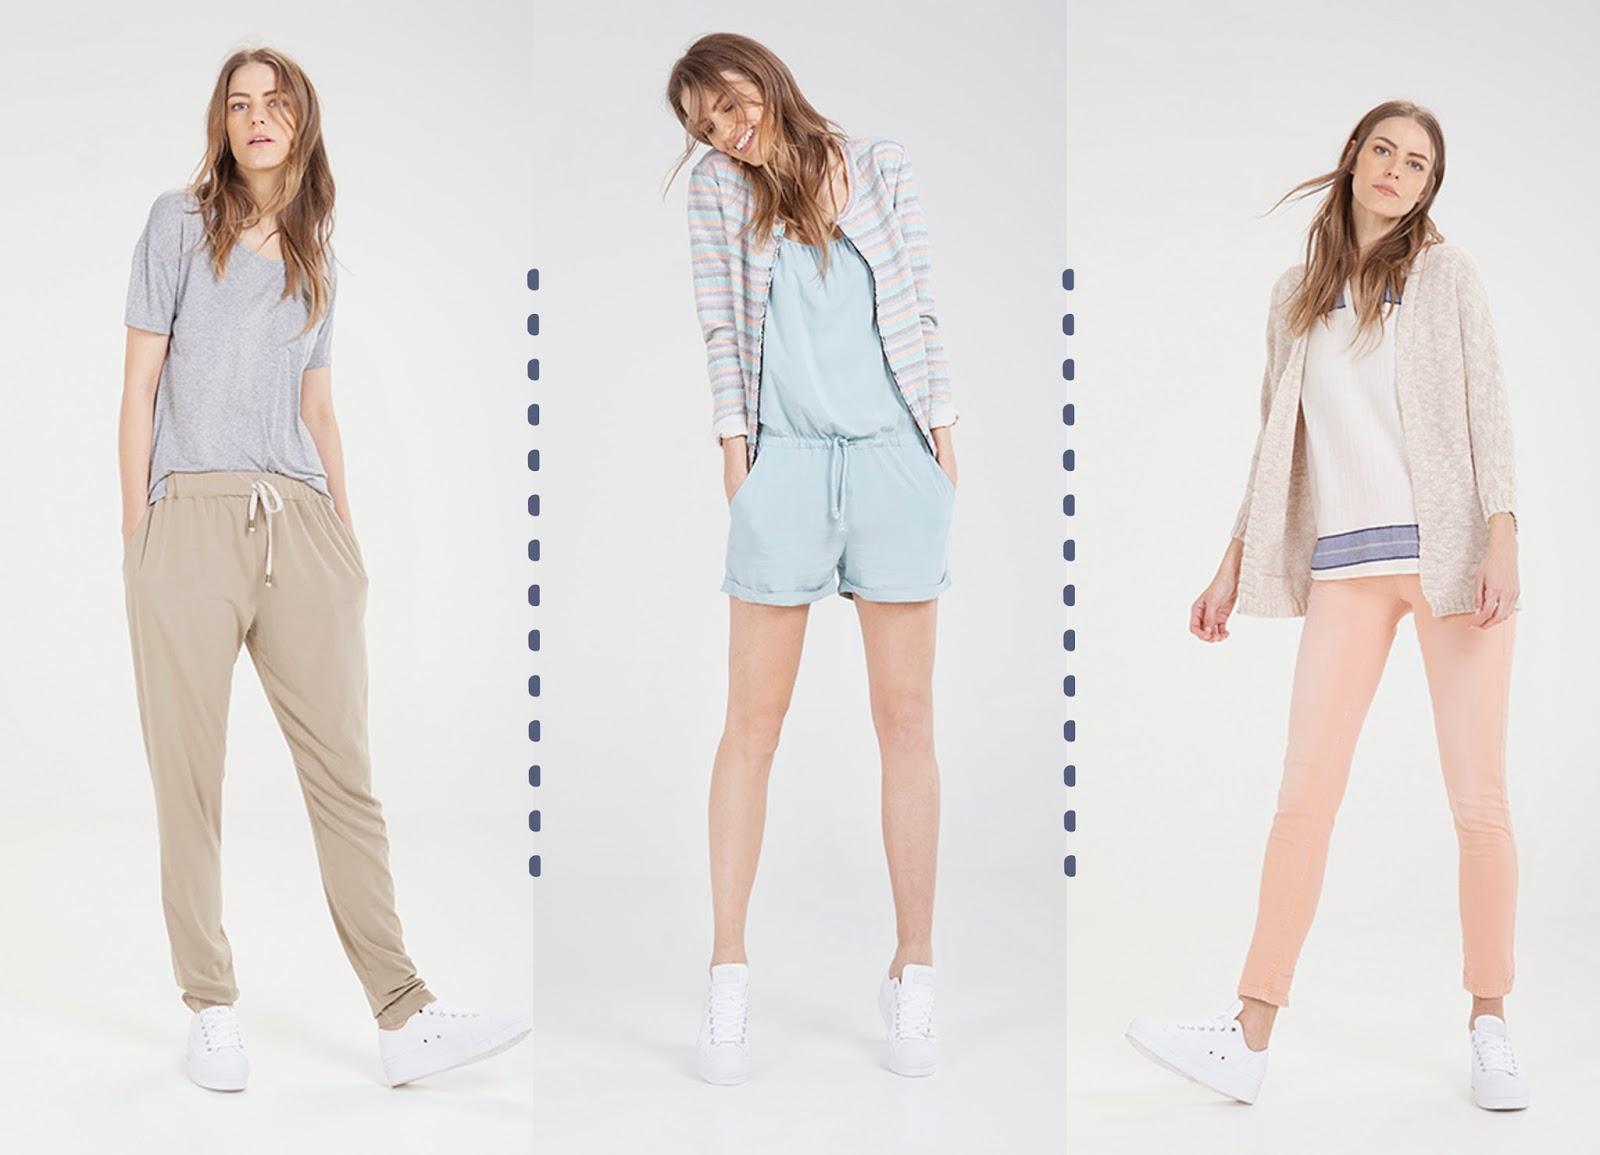 codigo-basico-coleccion-2015-ropa-basica